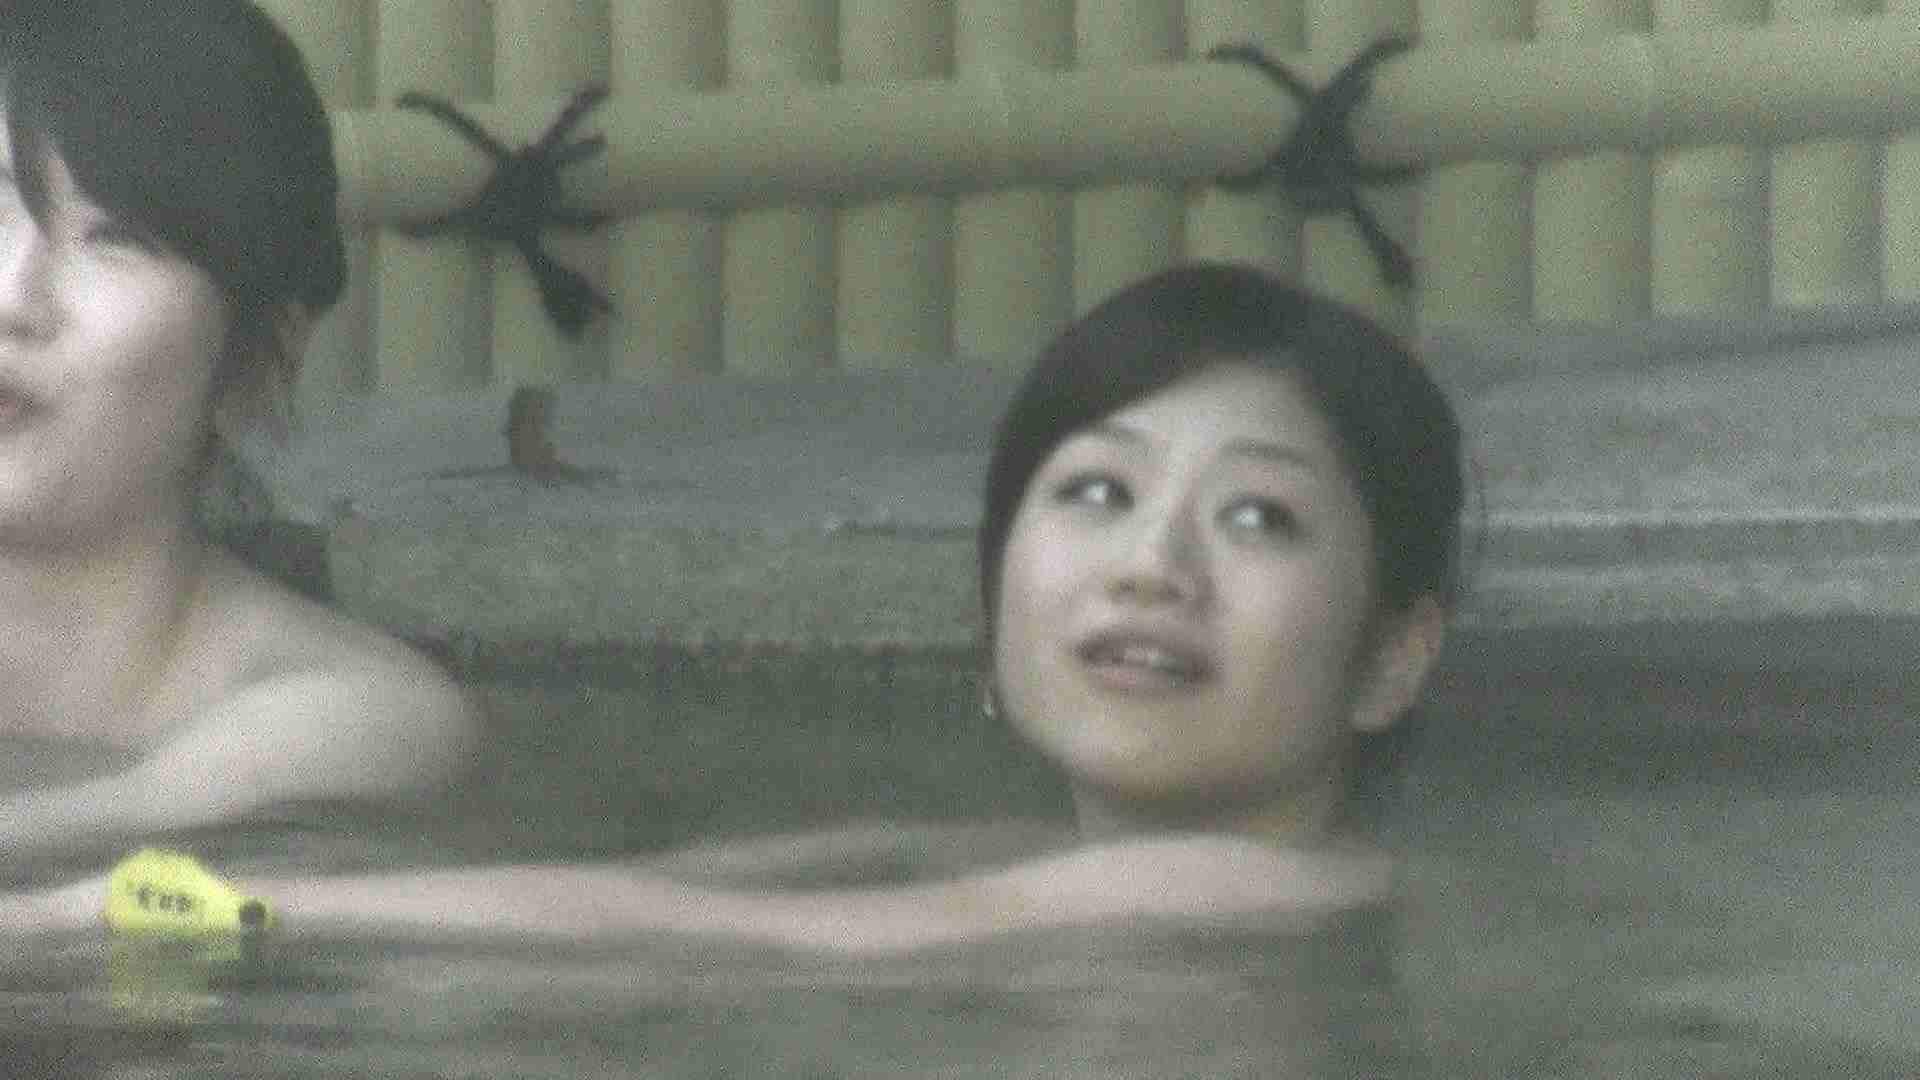 Aquaな露天風呂Vol.206 OL女体 オマンコ動画キャプチャ 80連発 35